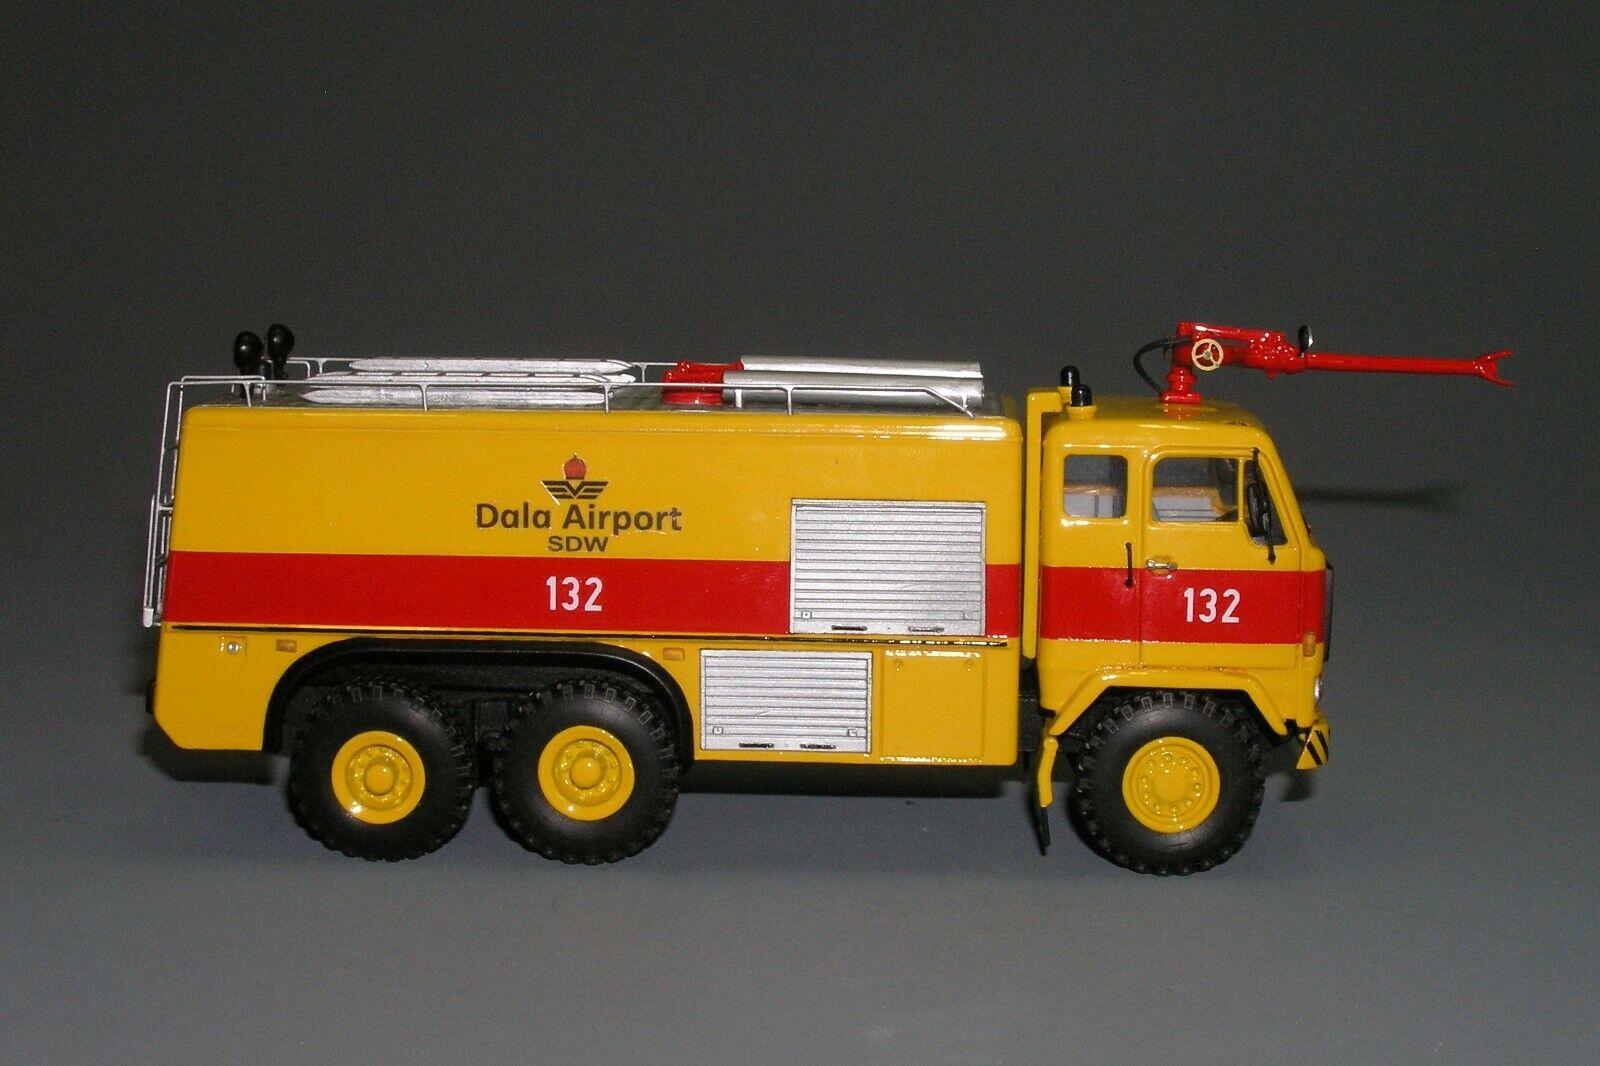 rara    Volvo F89 - 42 6x6 Camión De Bomberos Aeropuerto Dala Hecho a Mano Vector Modelo 1 43